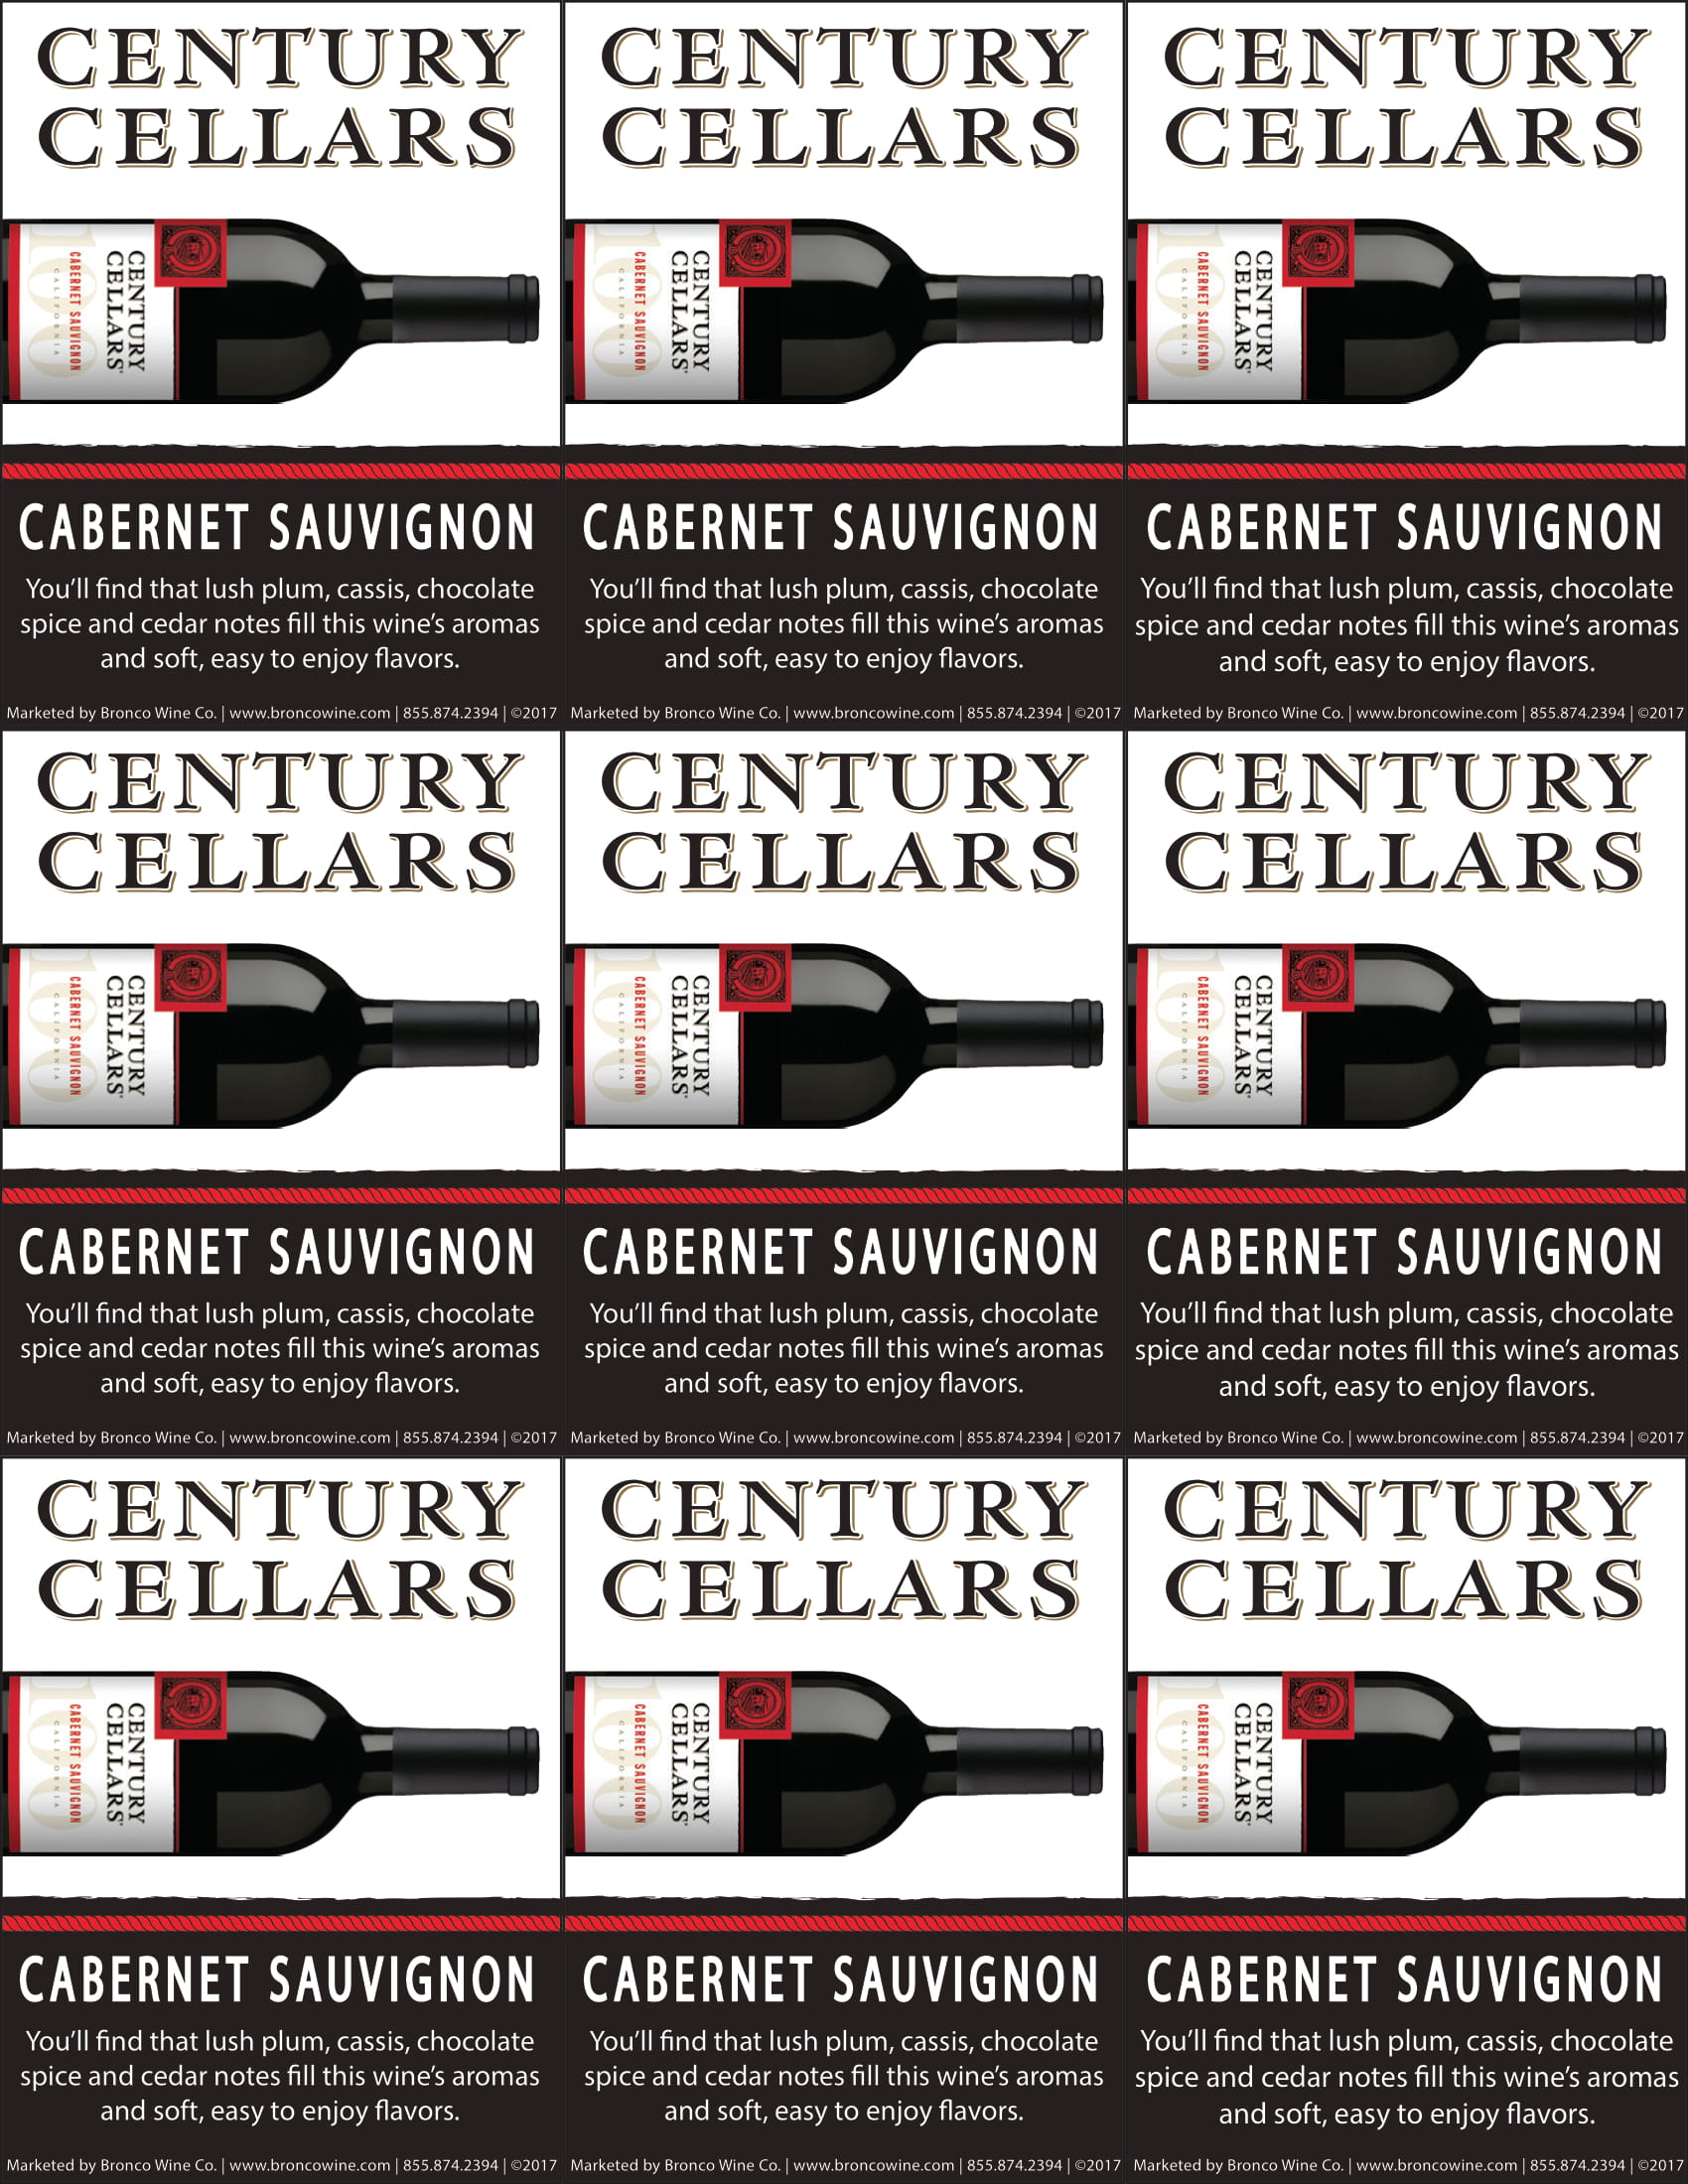 Century Cellars Cabernet Sauvignon Shelf Talkers